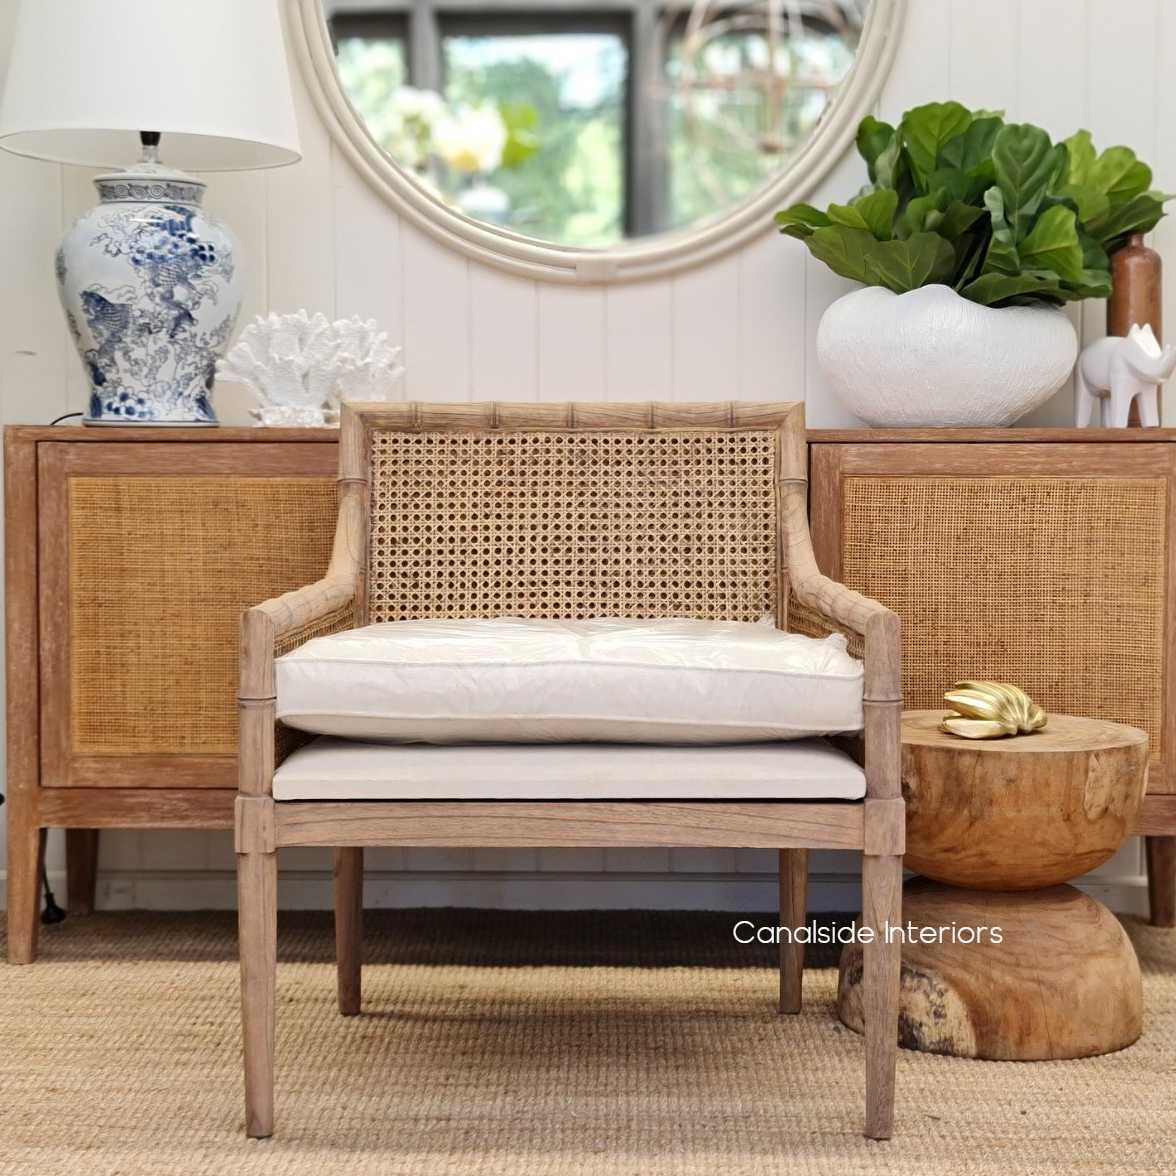 Palmer Plantation Rattan Armchair Cane CHAIRS, HAMPTONS Style, PLANTATION Style, CHAIRS Lounge, LIVING Room, LIVING Chairs, PLANTATION STYLE Rattan Island living, british colonial